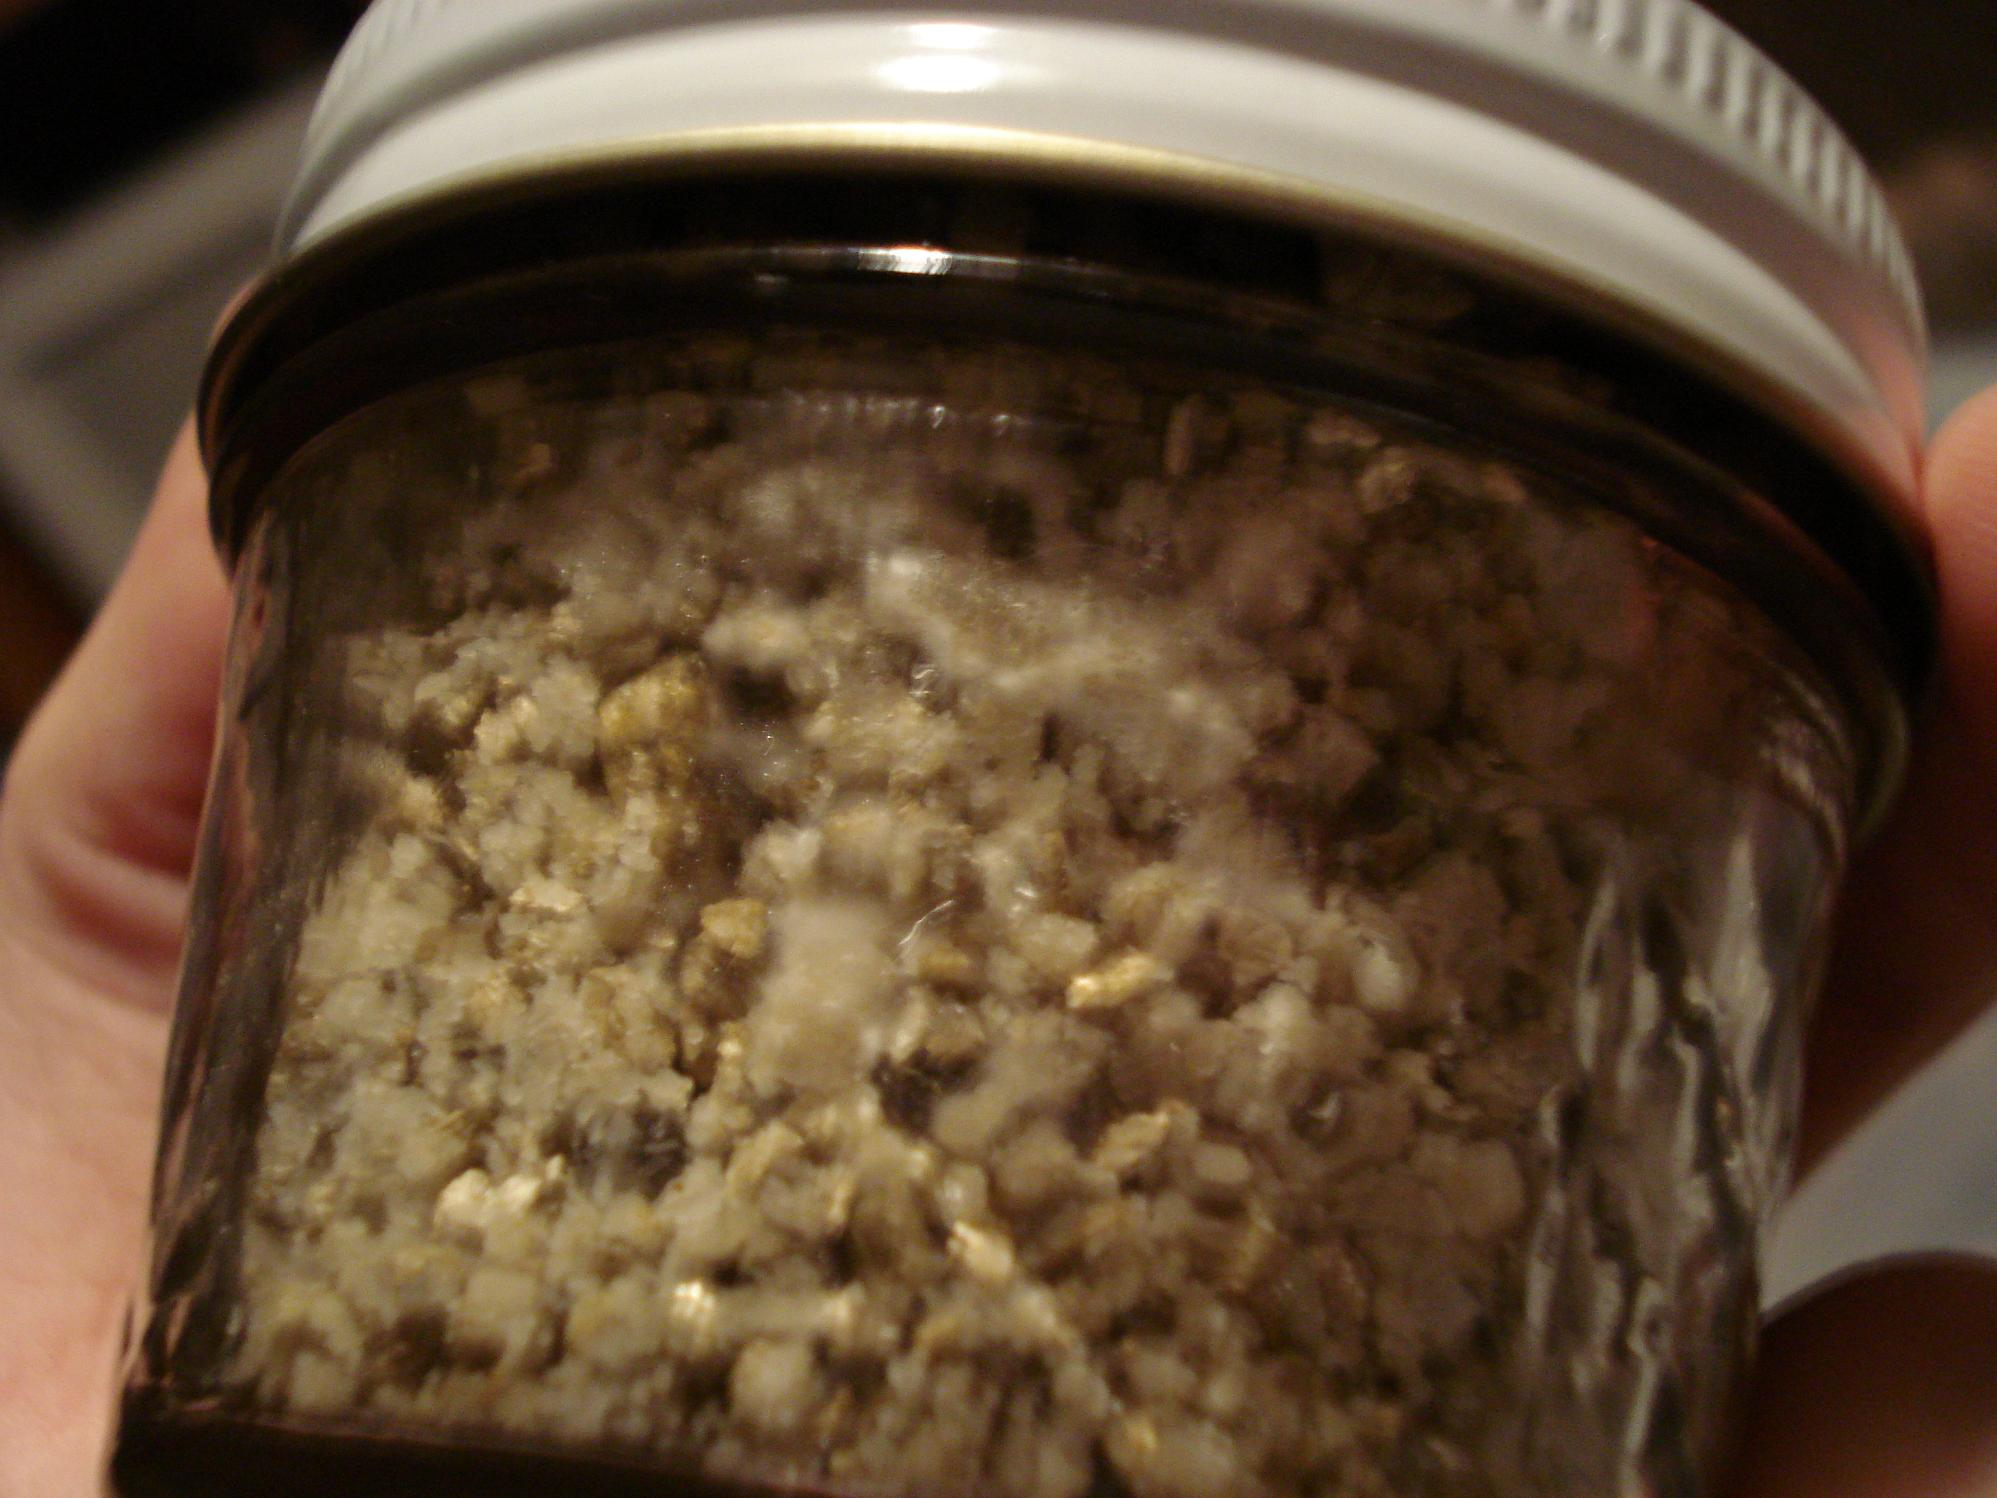 What Does Mold Smell Like >> Mycelium or mold? - Fungi: Magic Mushrooms - Mycotopia